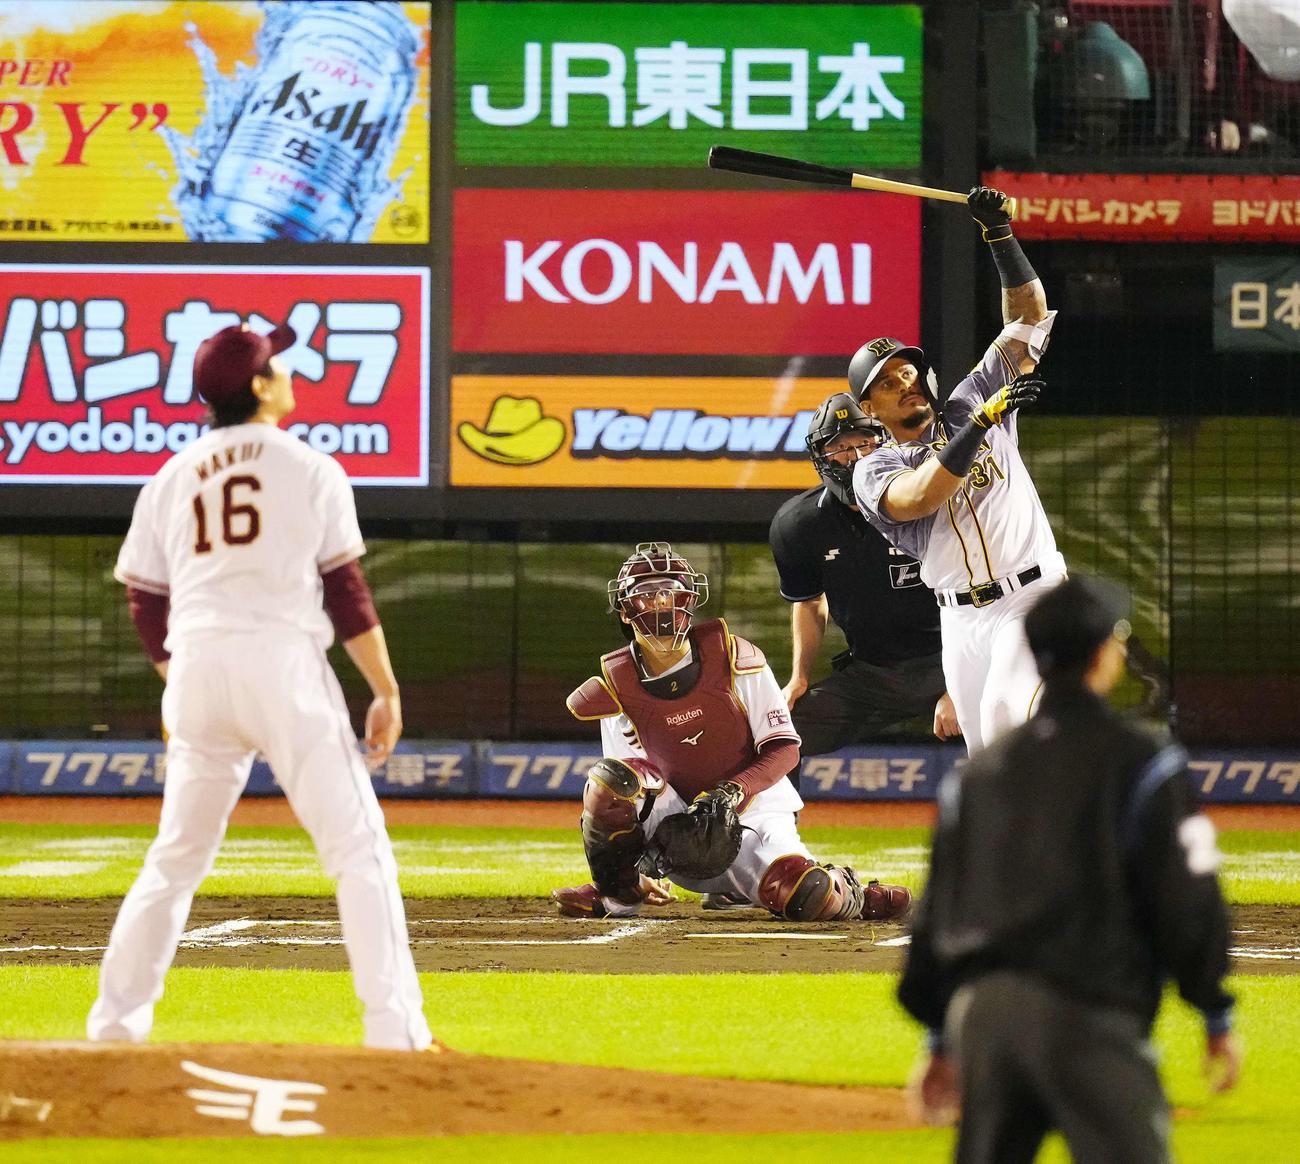 楽天対阪神 6回表阪神1死三塁、左越え逆転2点本塁打を放つマルテ。投手涌井(撮影・江口和貴)